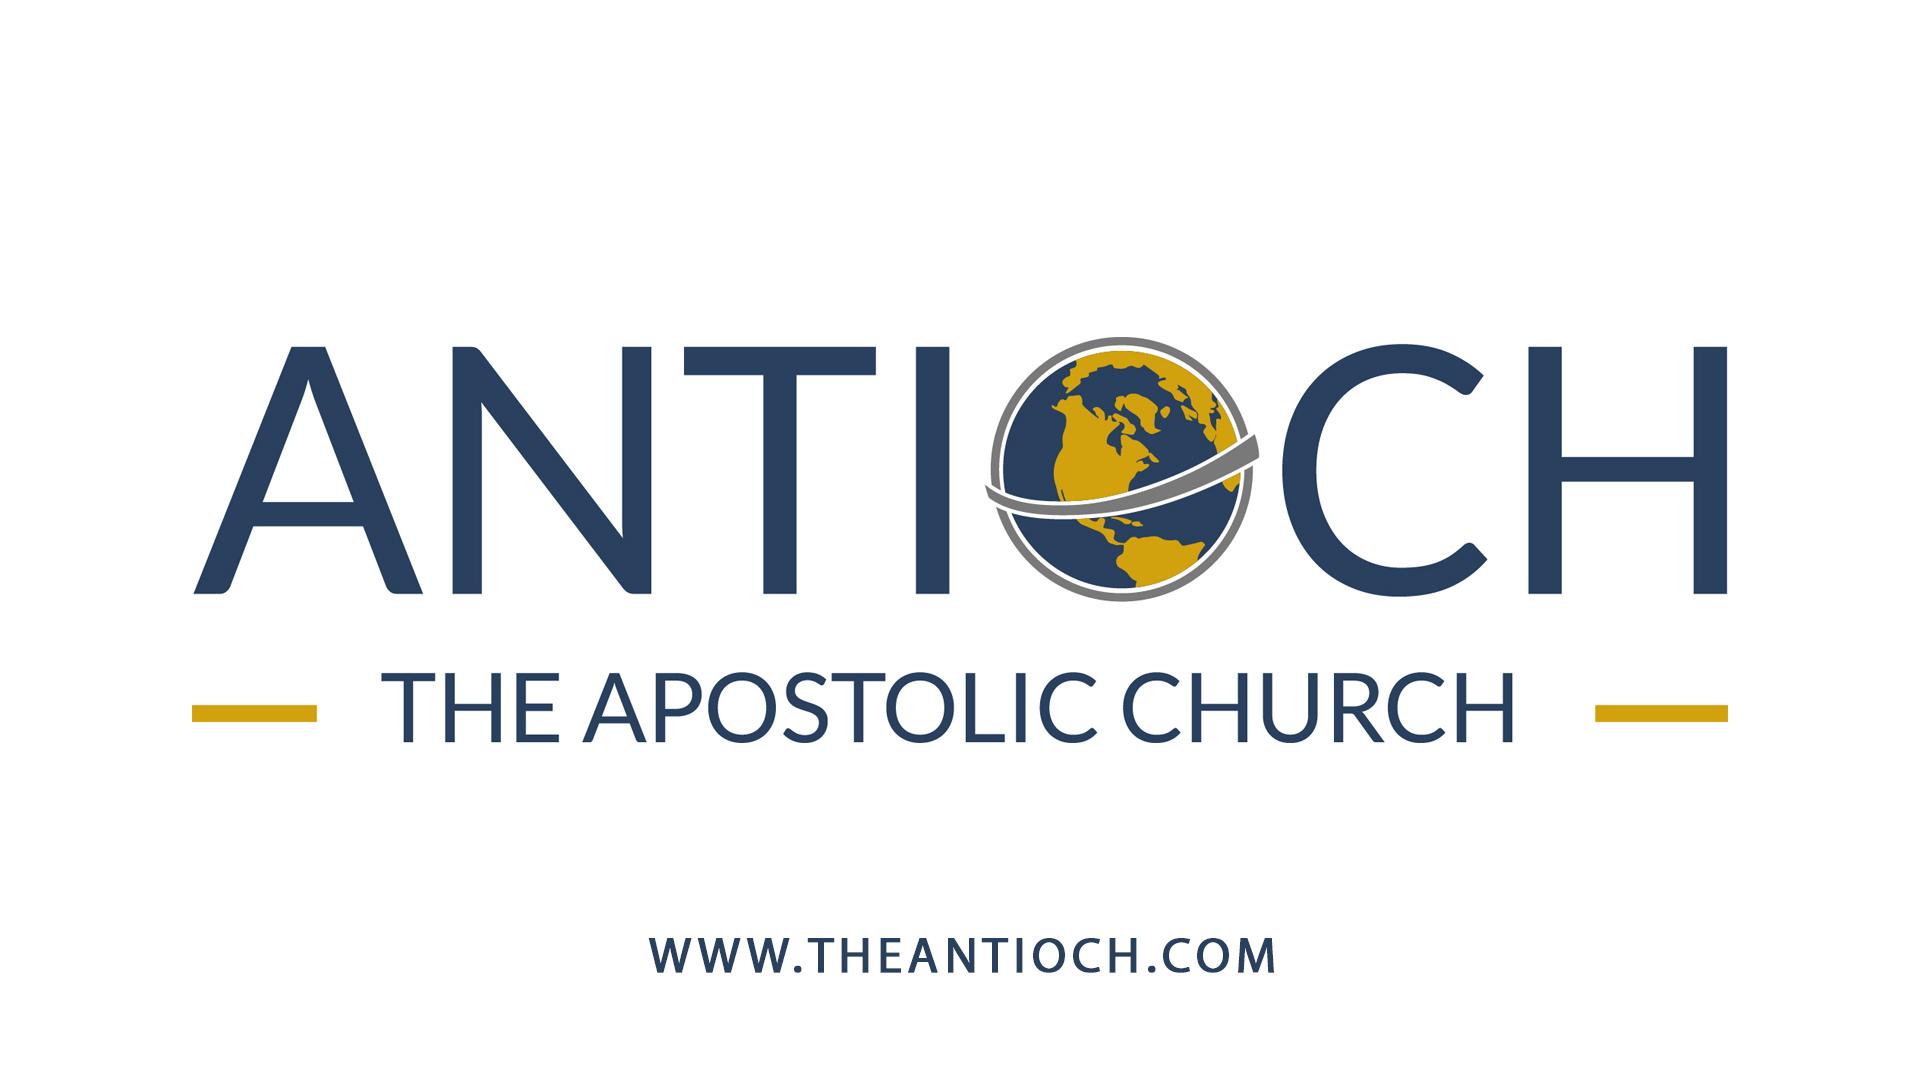 Antioch Central Live Service on Livestream